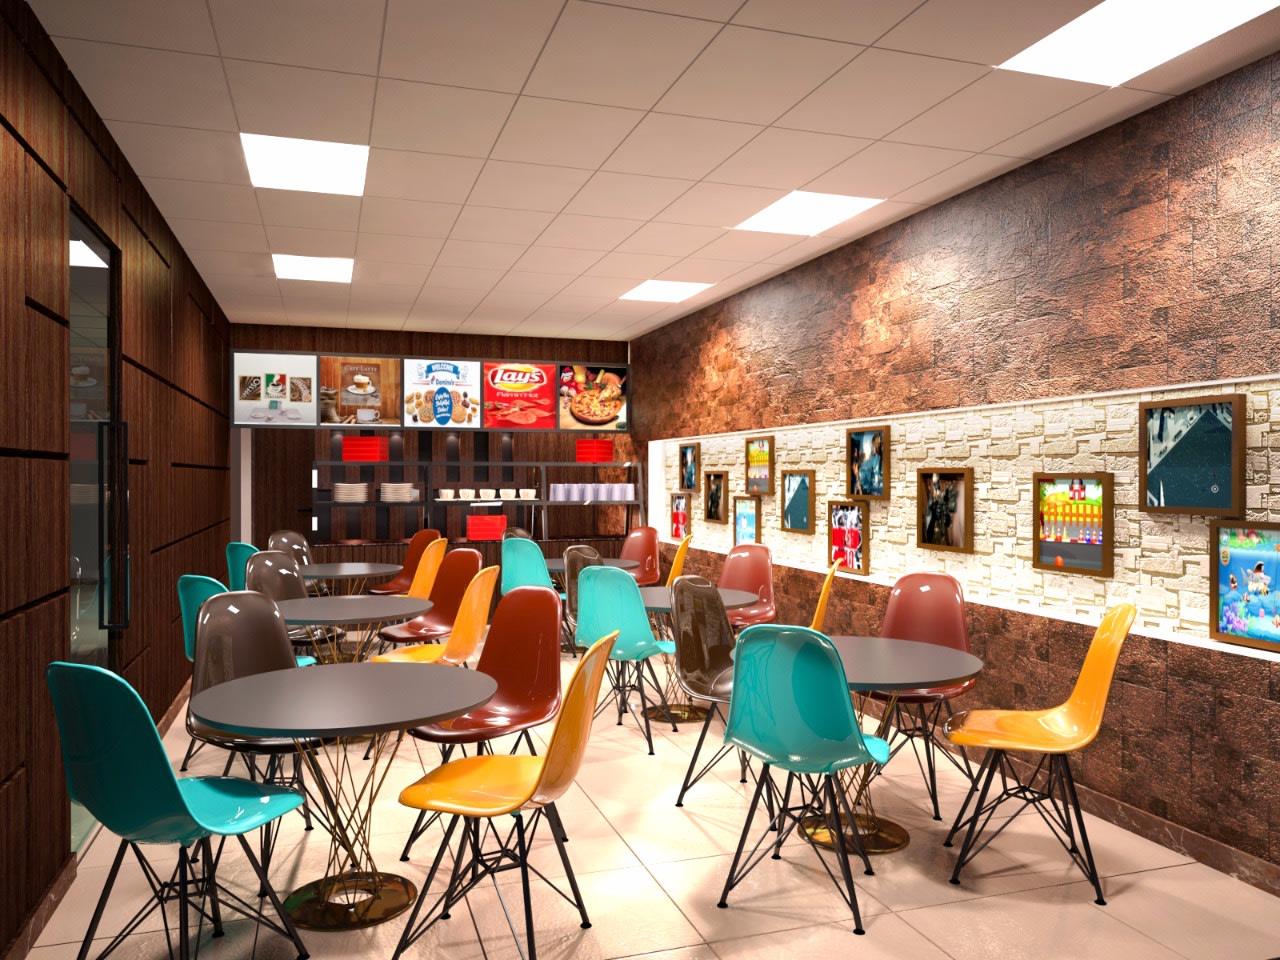 Cafe Interior Styles by Abhinav Gupta Contemporary | Interior Design Photos & Ideas